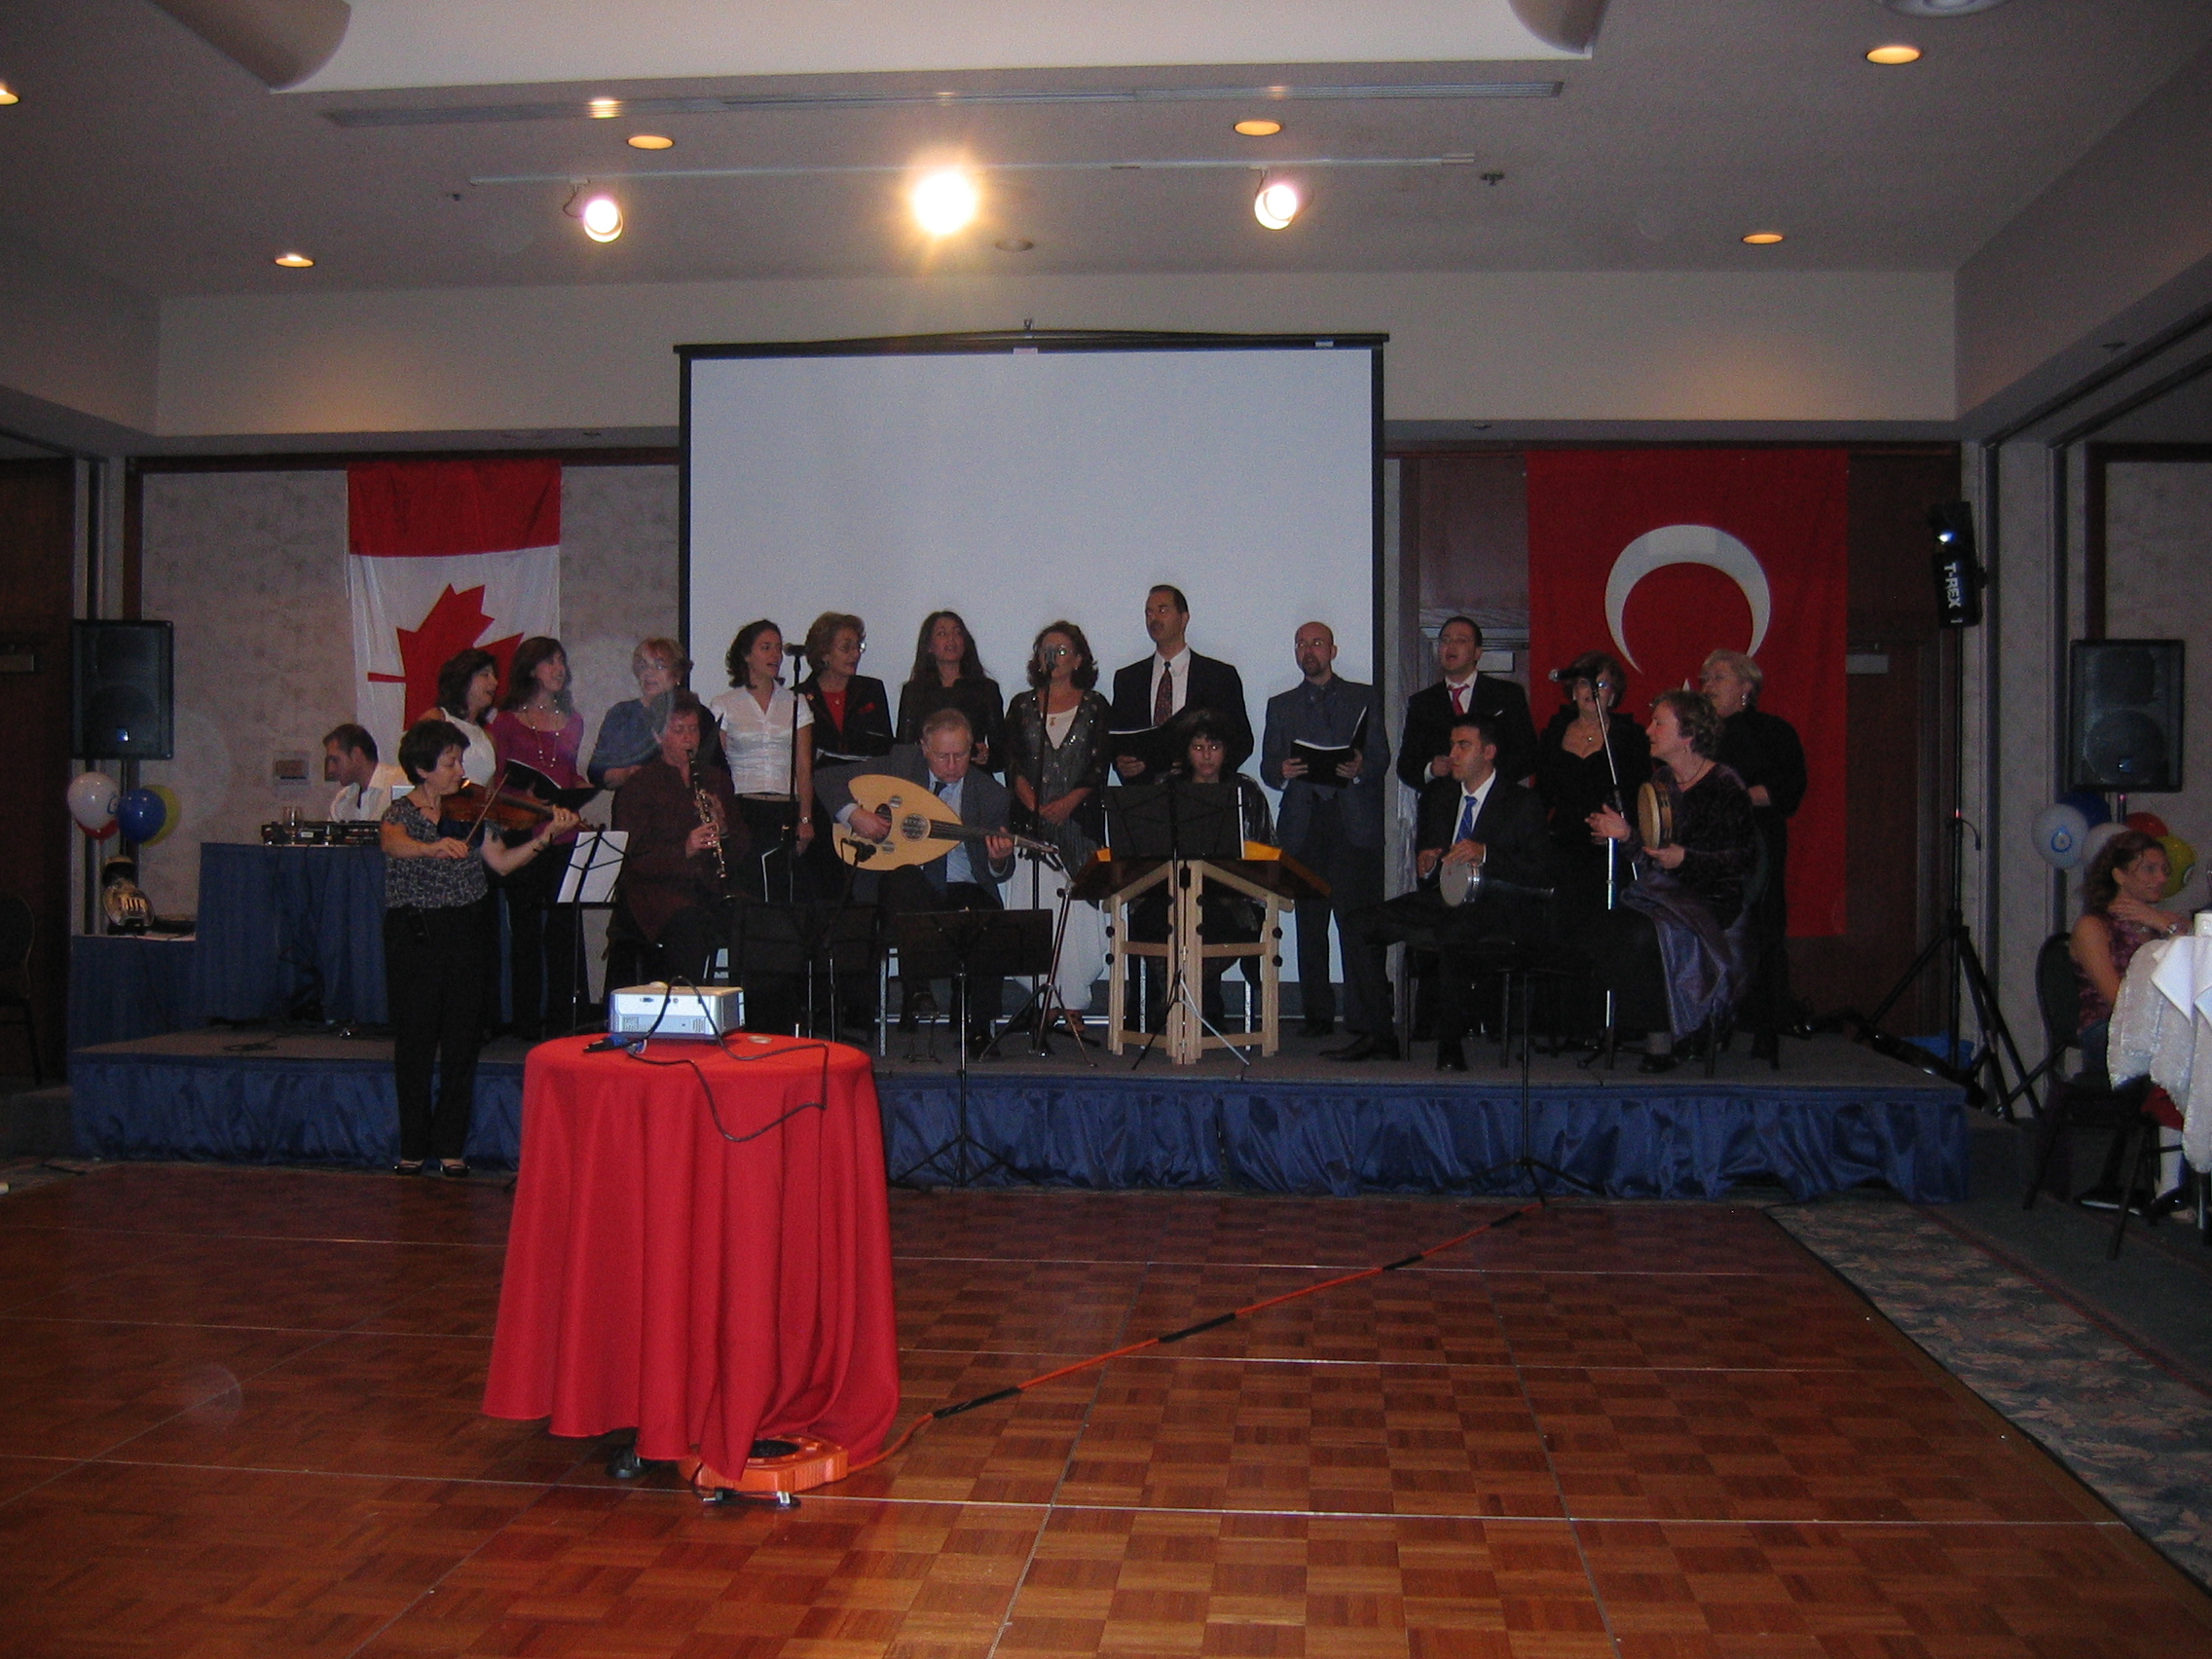 oct26-2008_cumhuriyetbalo2